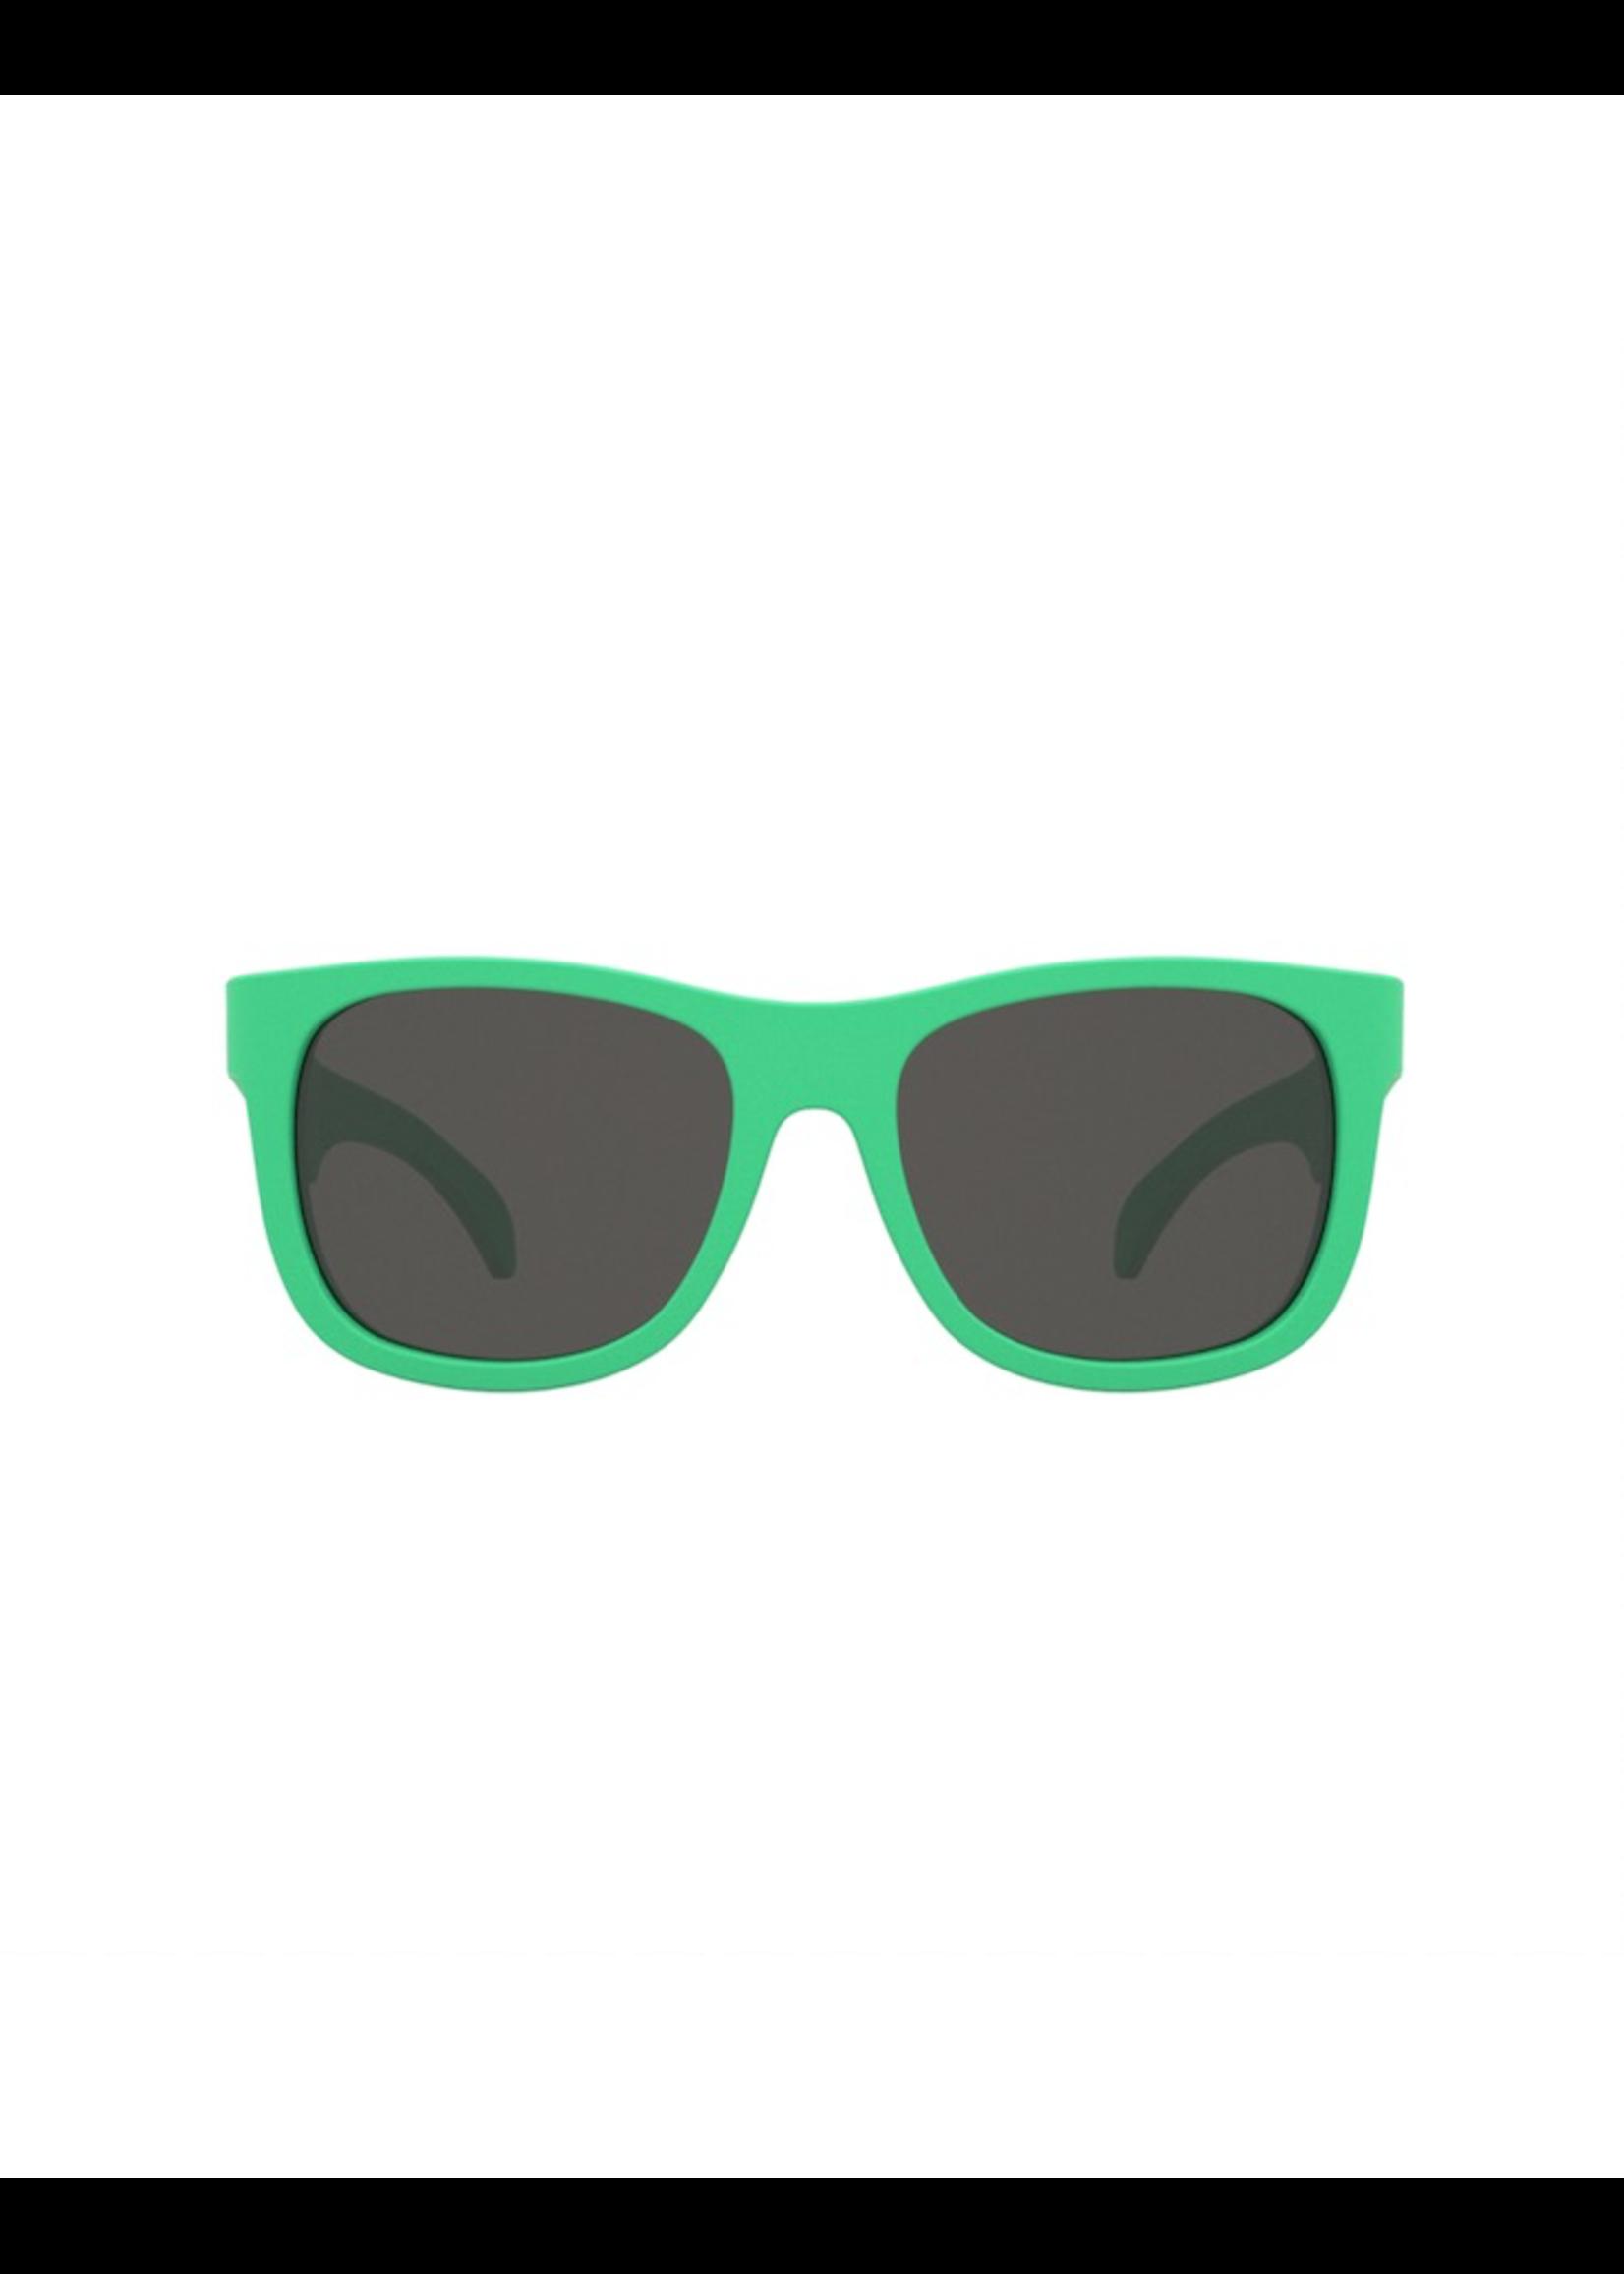 Babiators Babiators, Limited Edition, Navigator, Sunglasses, Tropical Green